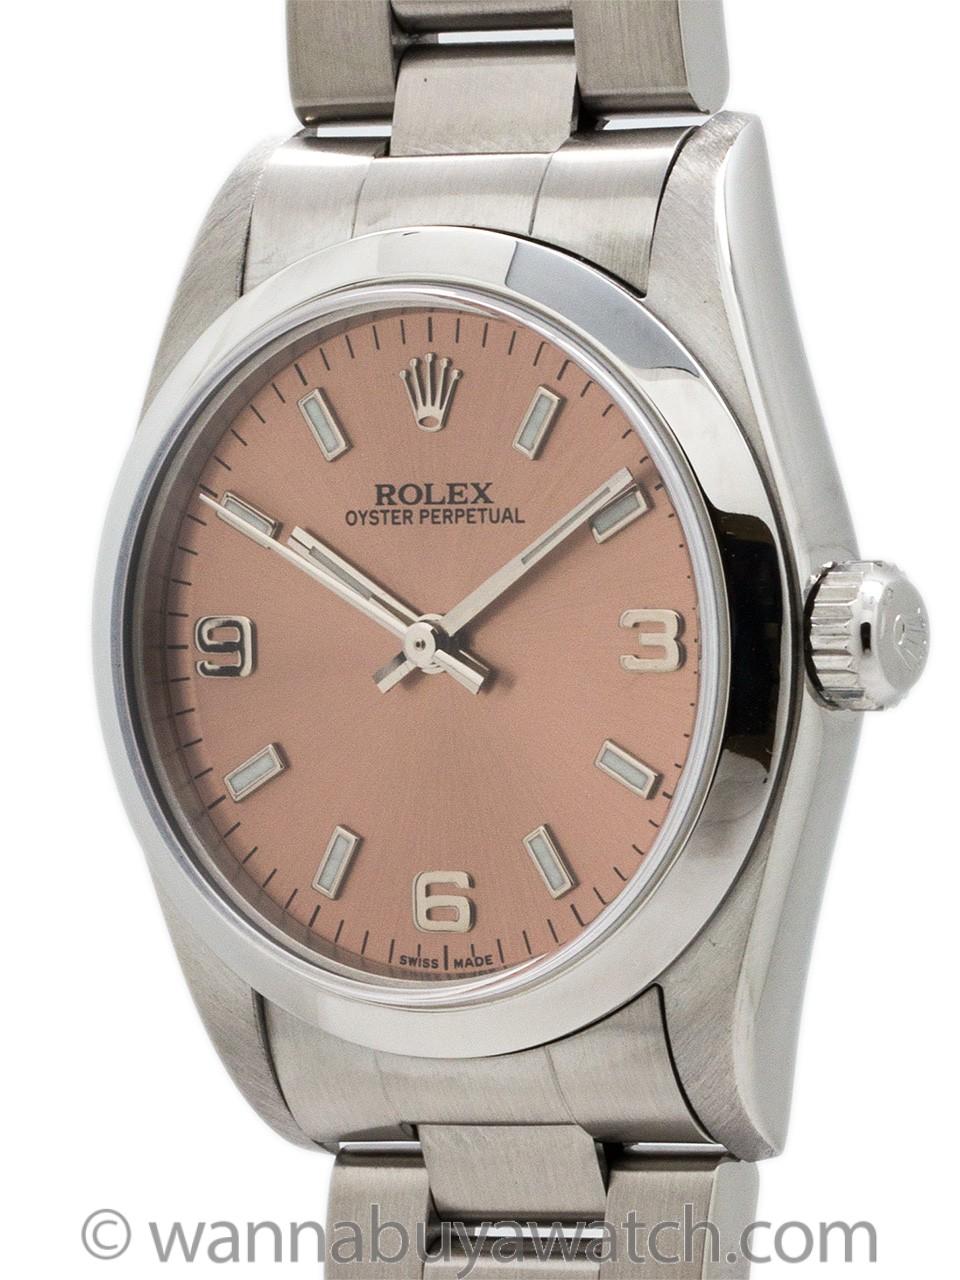 Rolex Oyster Perpetual Midsize ref 67480 circa 1996